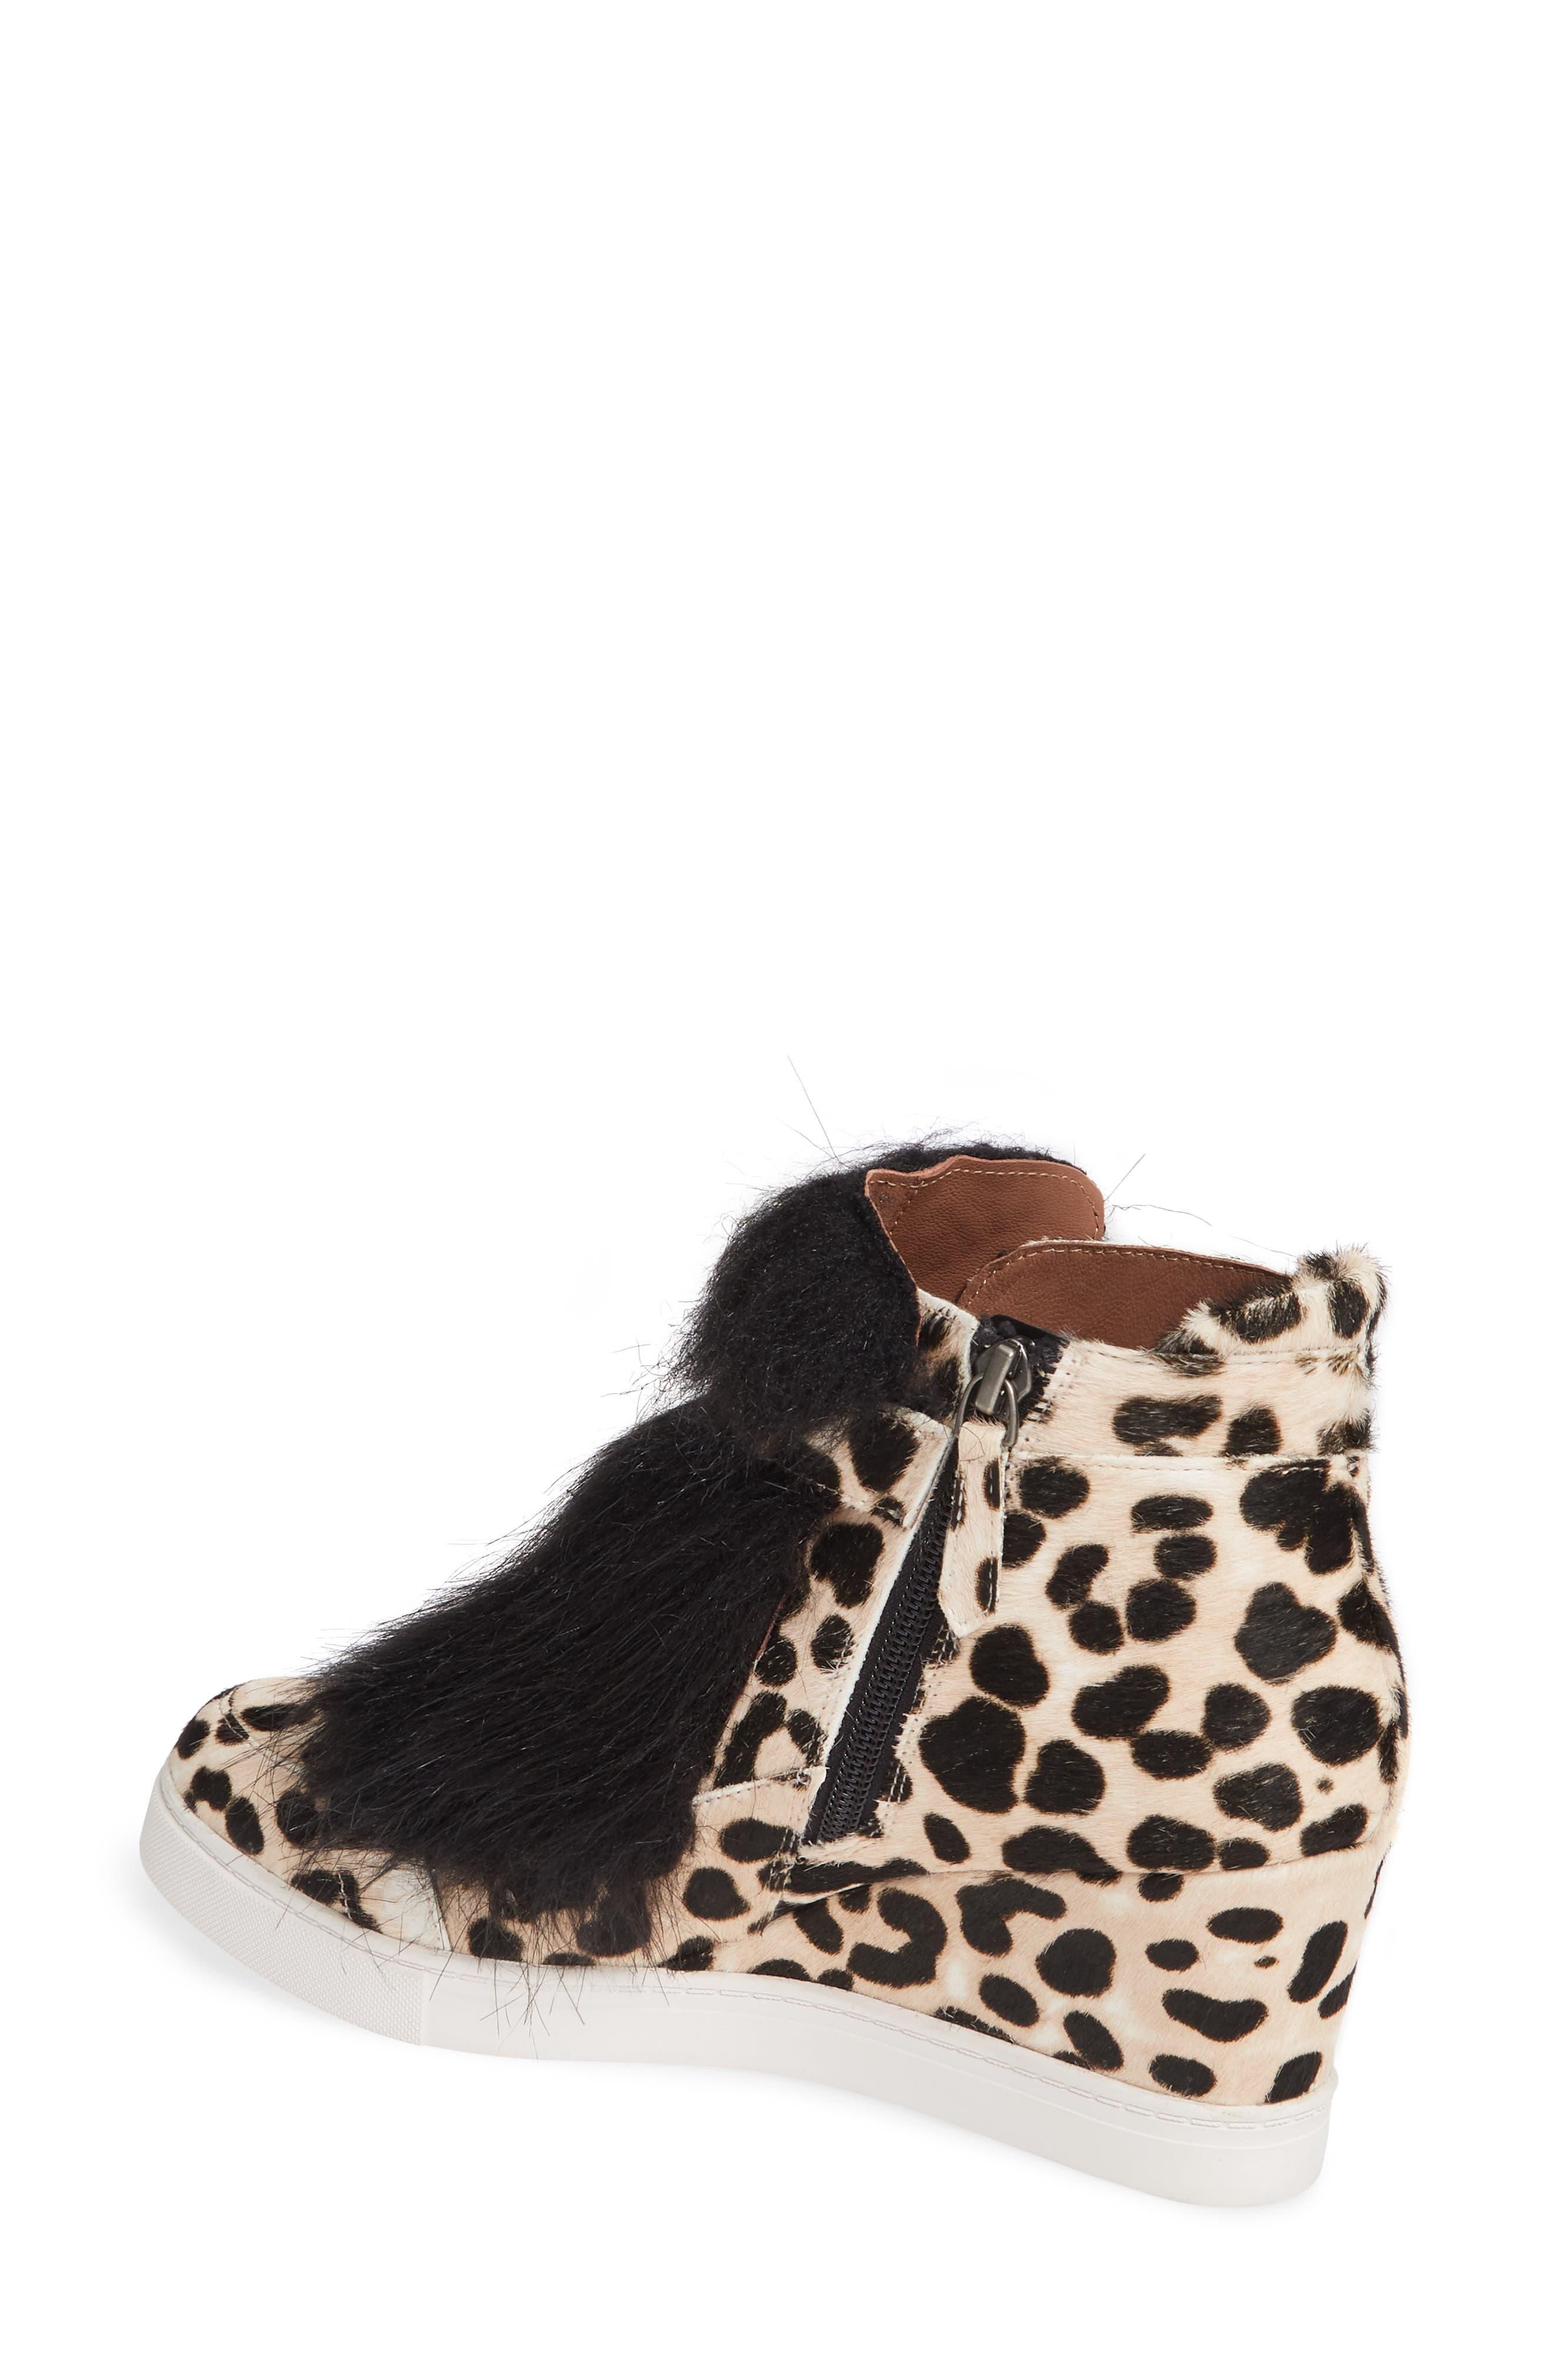 LINEA PAOLO, Fifi 2 Wedge Sneaker, Alternate thumbnail 2, color, WHITE/ BLACK LEOPARD HAIRCALF